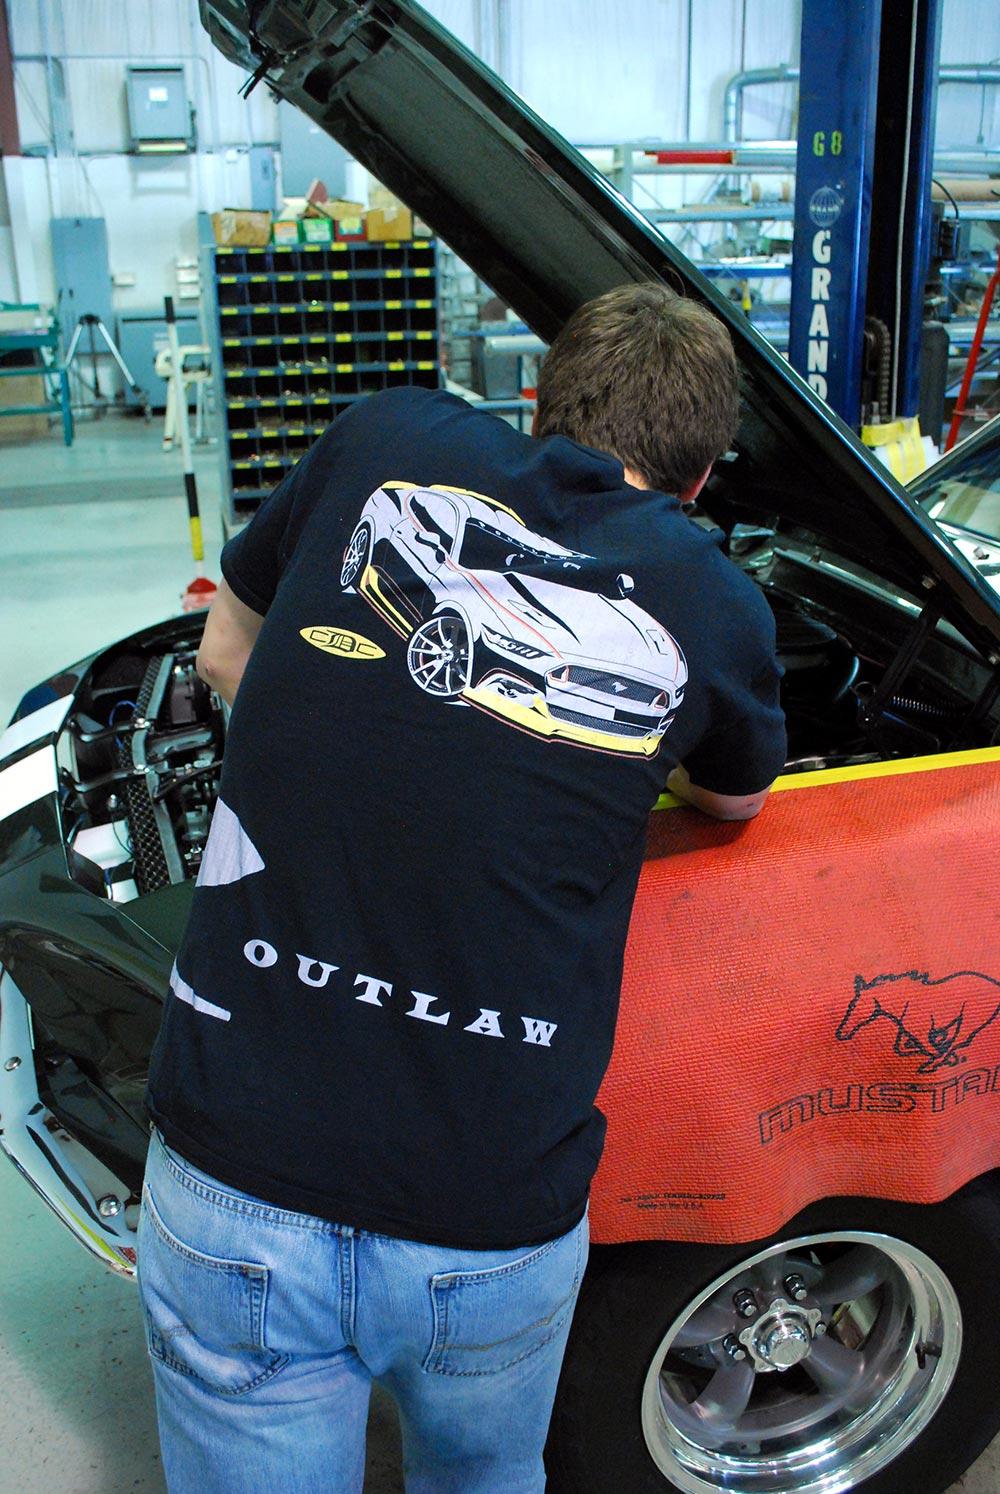 outlaw-shirt-2.jpg